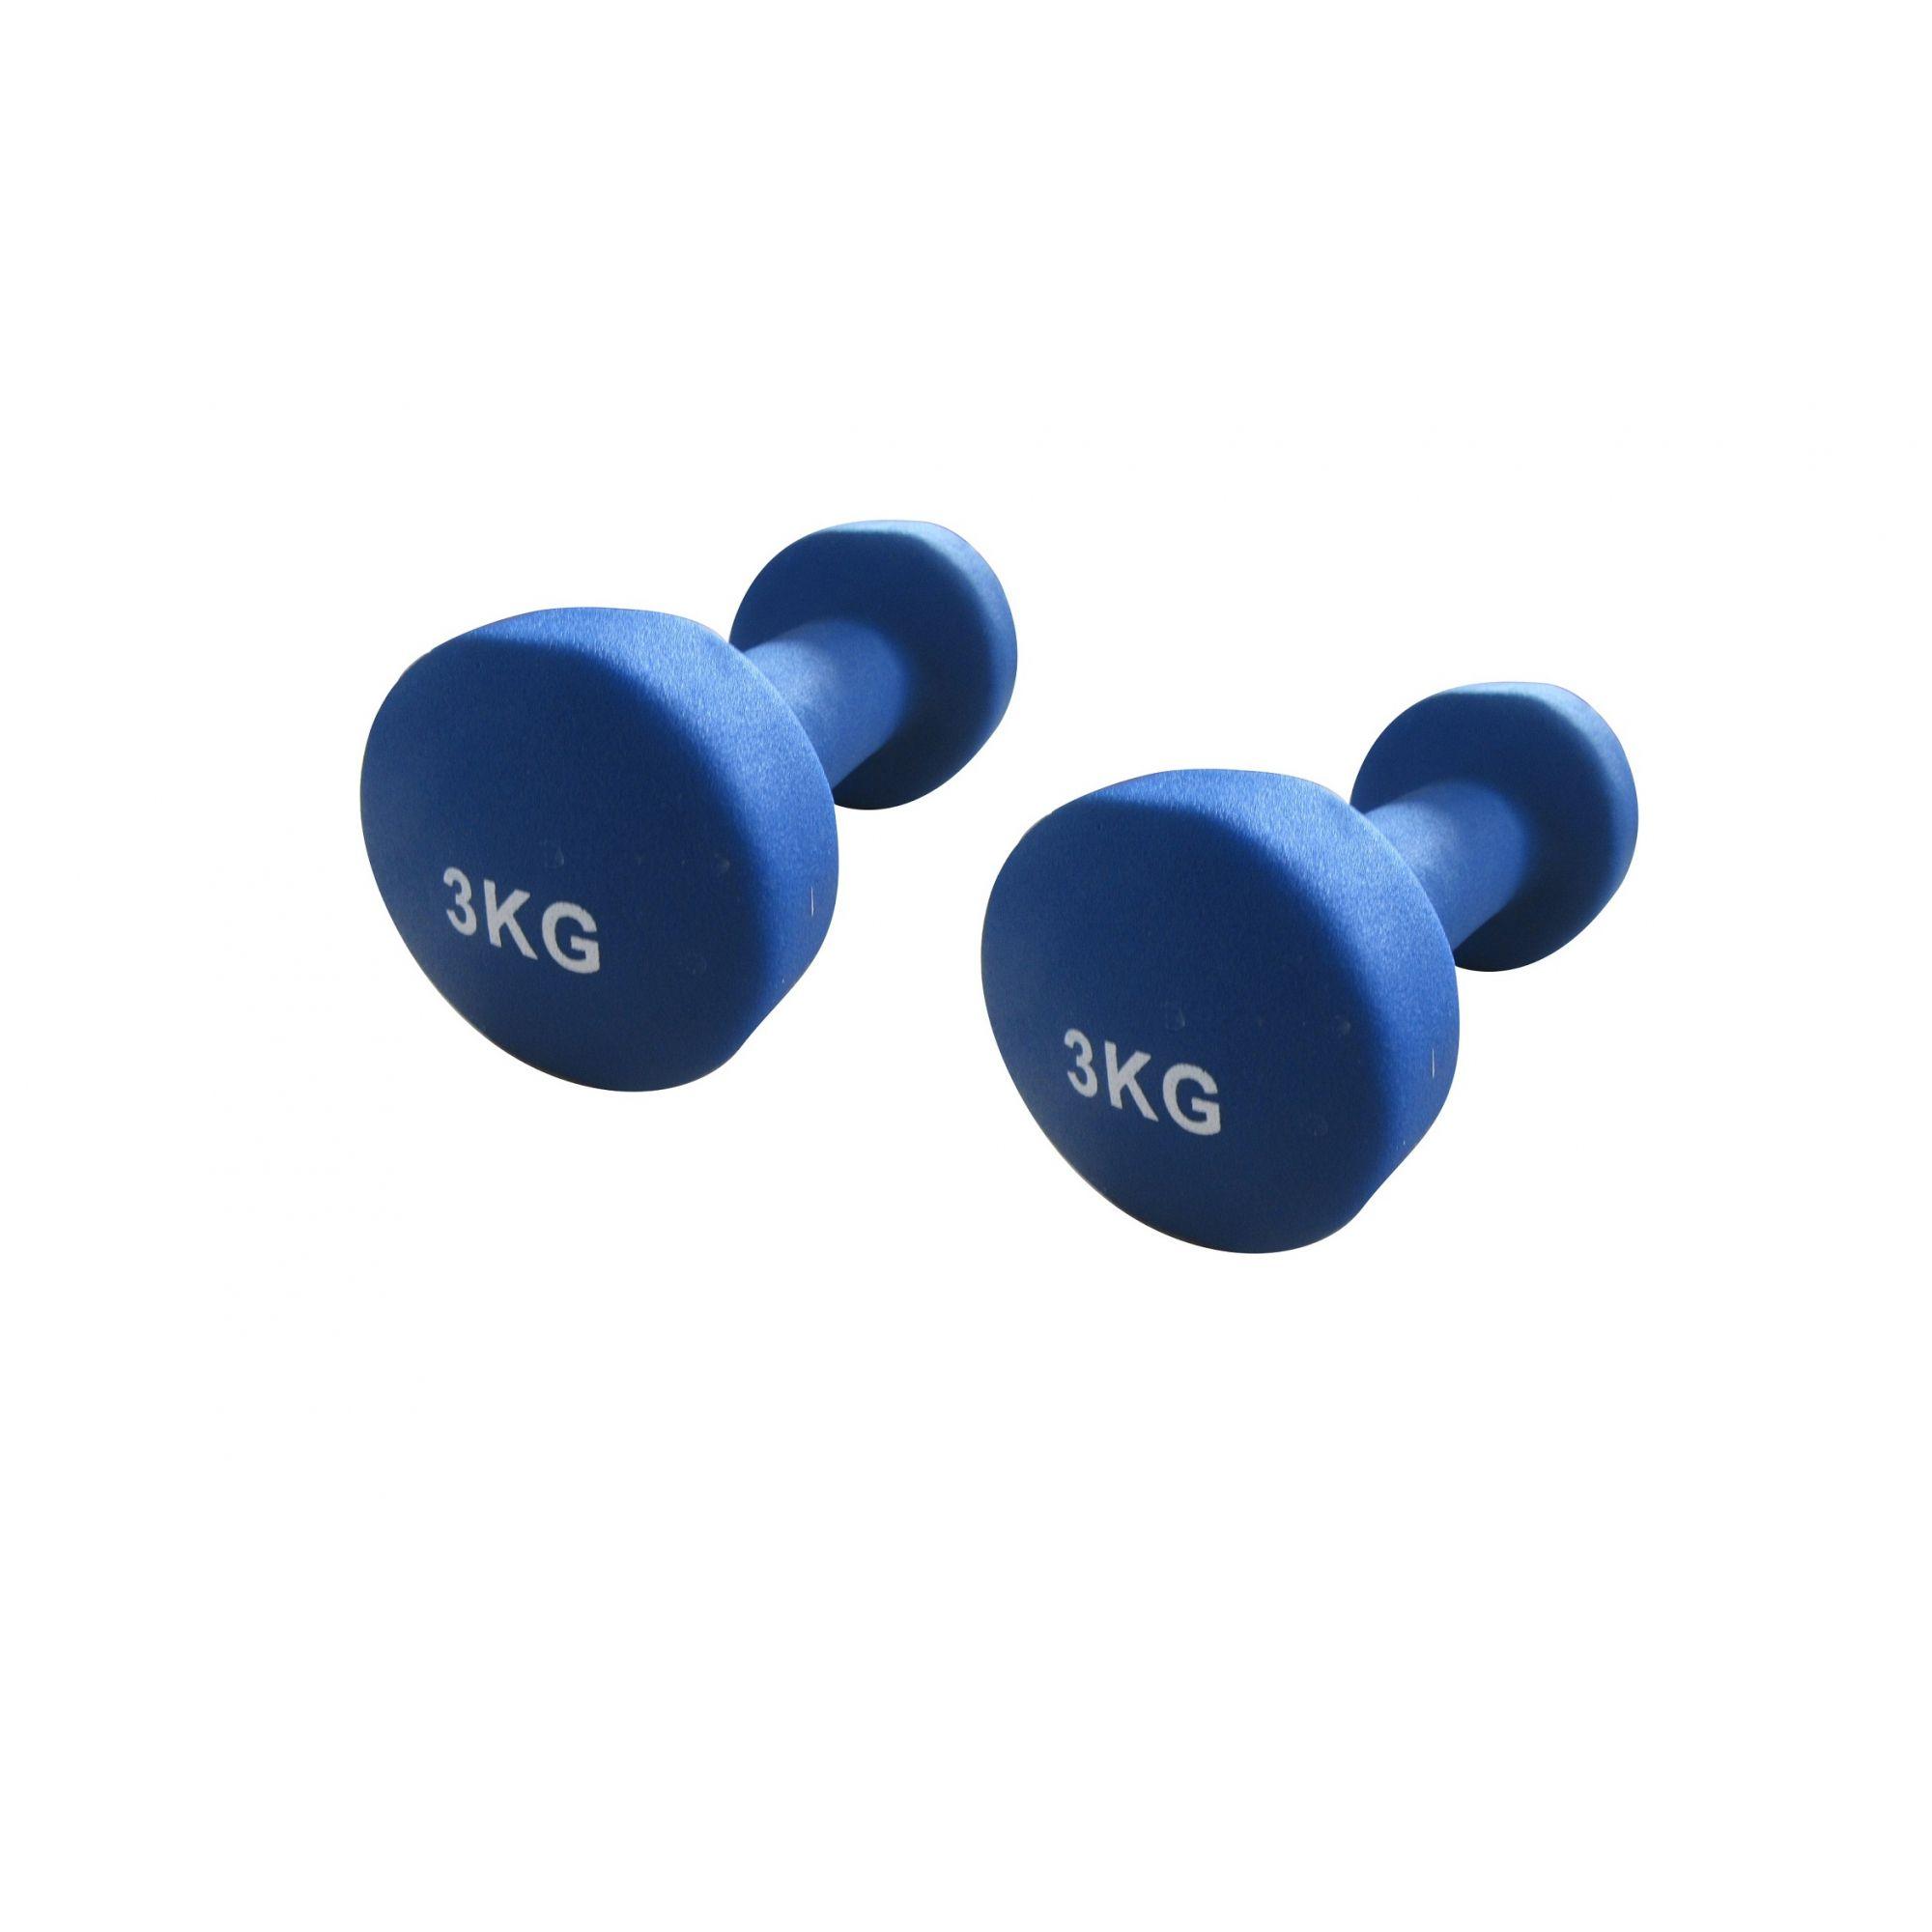 Kit 2 Halteres em Ferro Fundido Revestido com Neoprene Pelegrin PEL-03DB 3kg - Azul